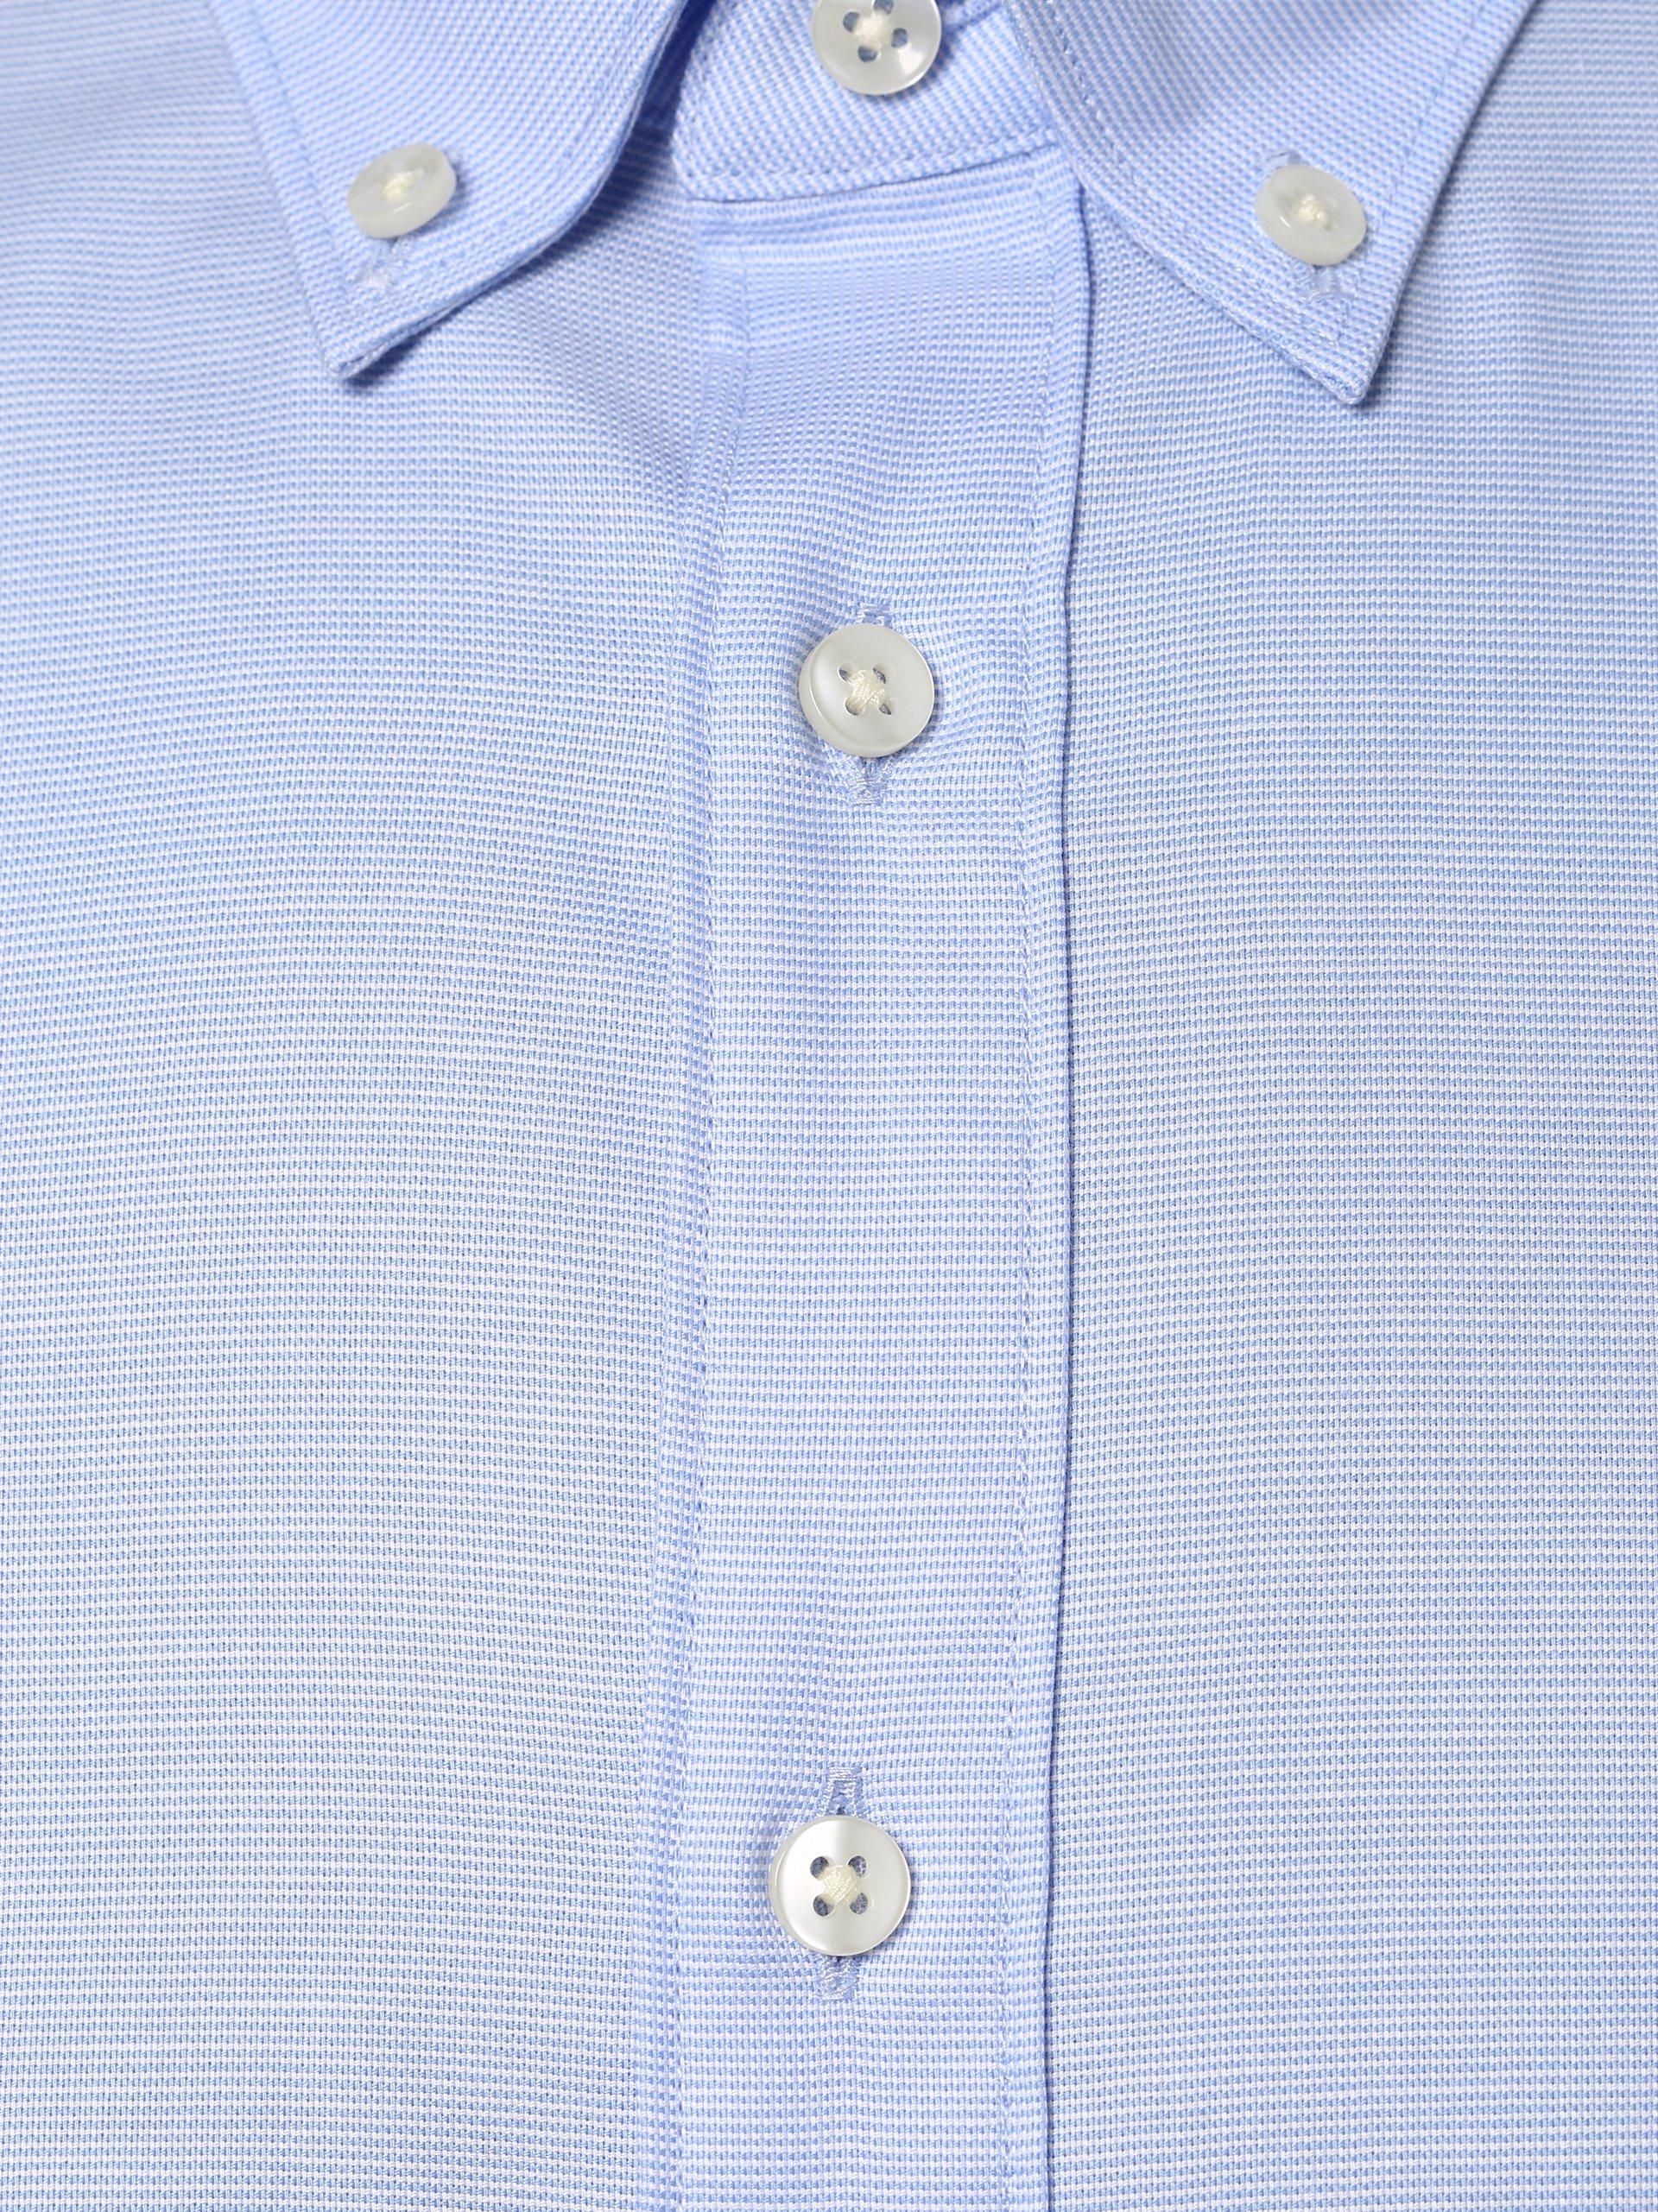 Tommy Hilfiger Tailored Koszula męska łatwa w prasowaniu